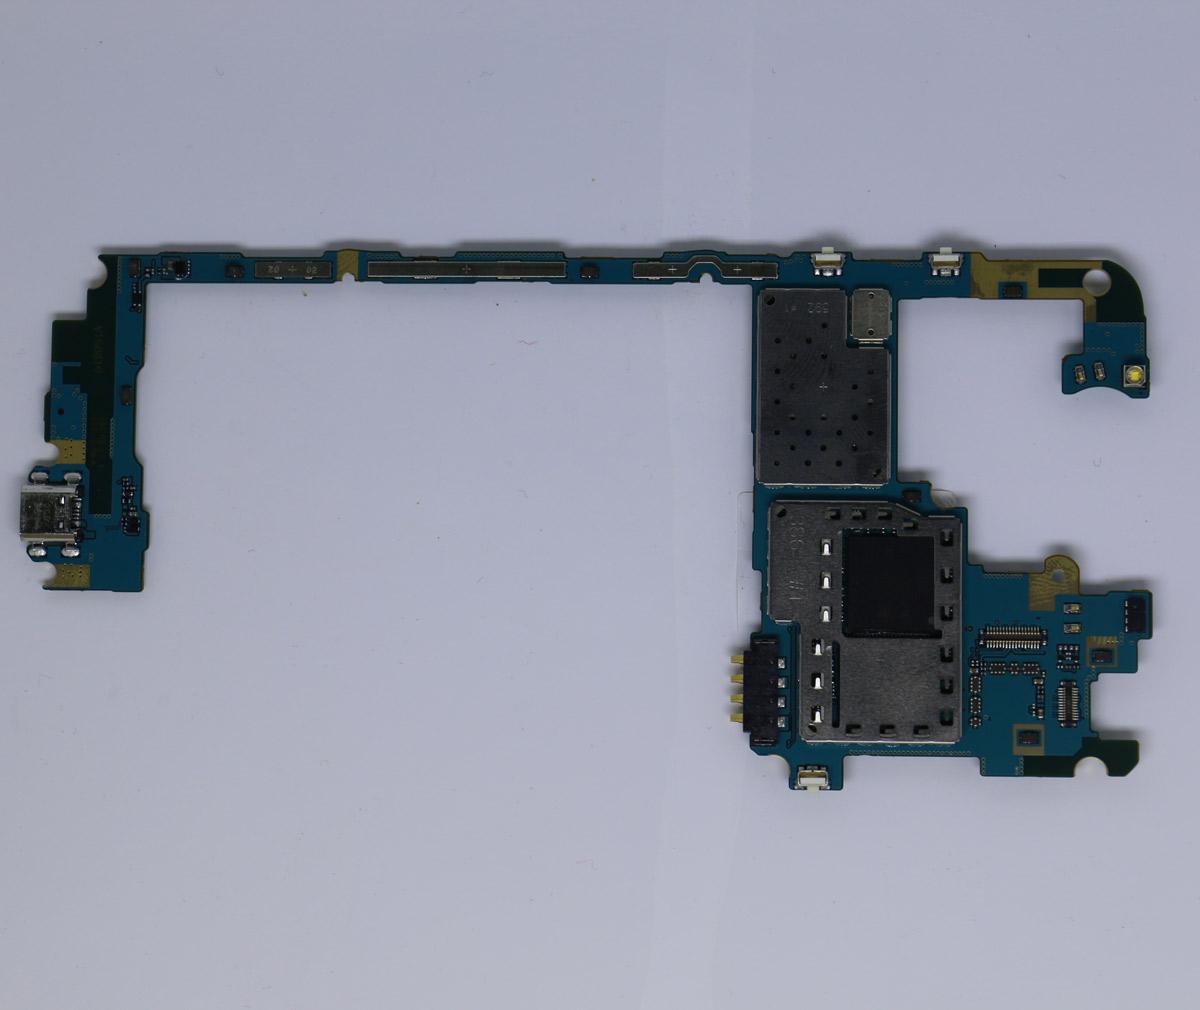 مادربرد اورجینال گوشی موبایل سامسونگ گلکسی جی7 سرویس شبکه 4 جی SM-J700F/DS